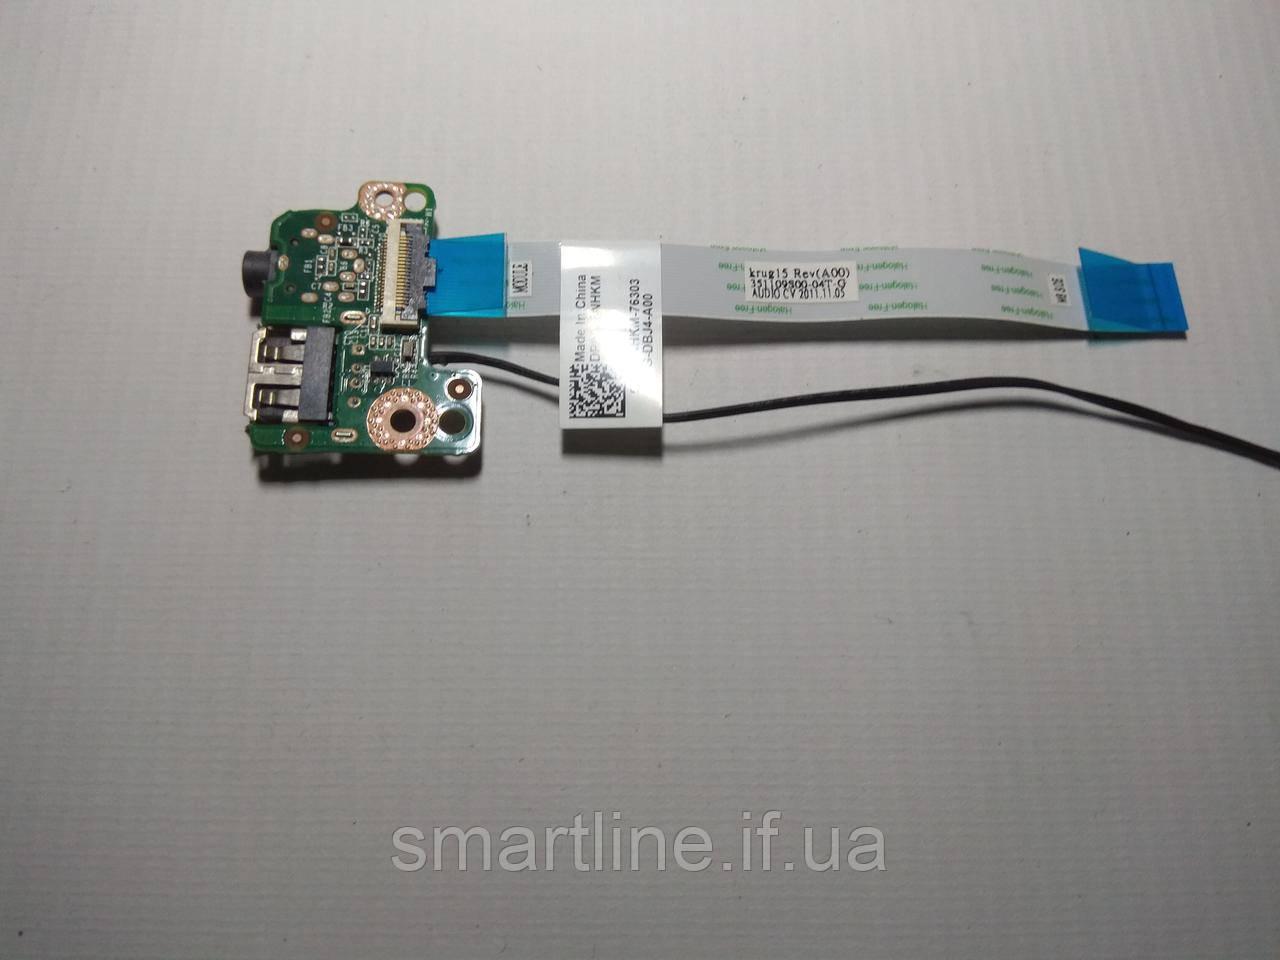 Плата Audio, USB для ноутбука Dell Latitude E5520, 35101C700, RCCF3302